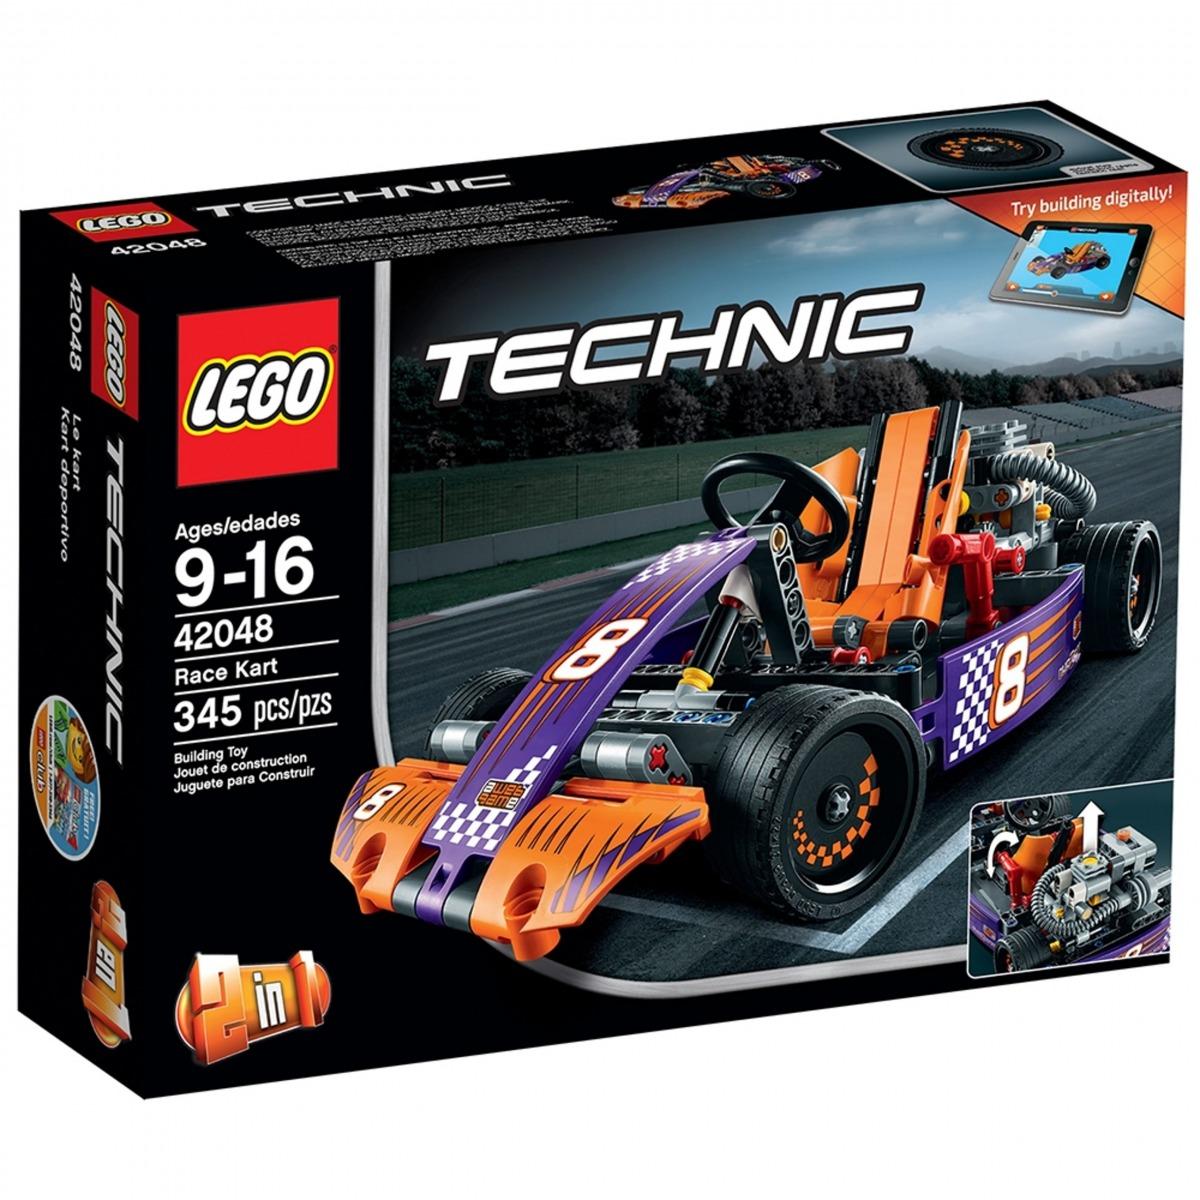 lego 42048 racekart scaled